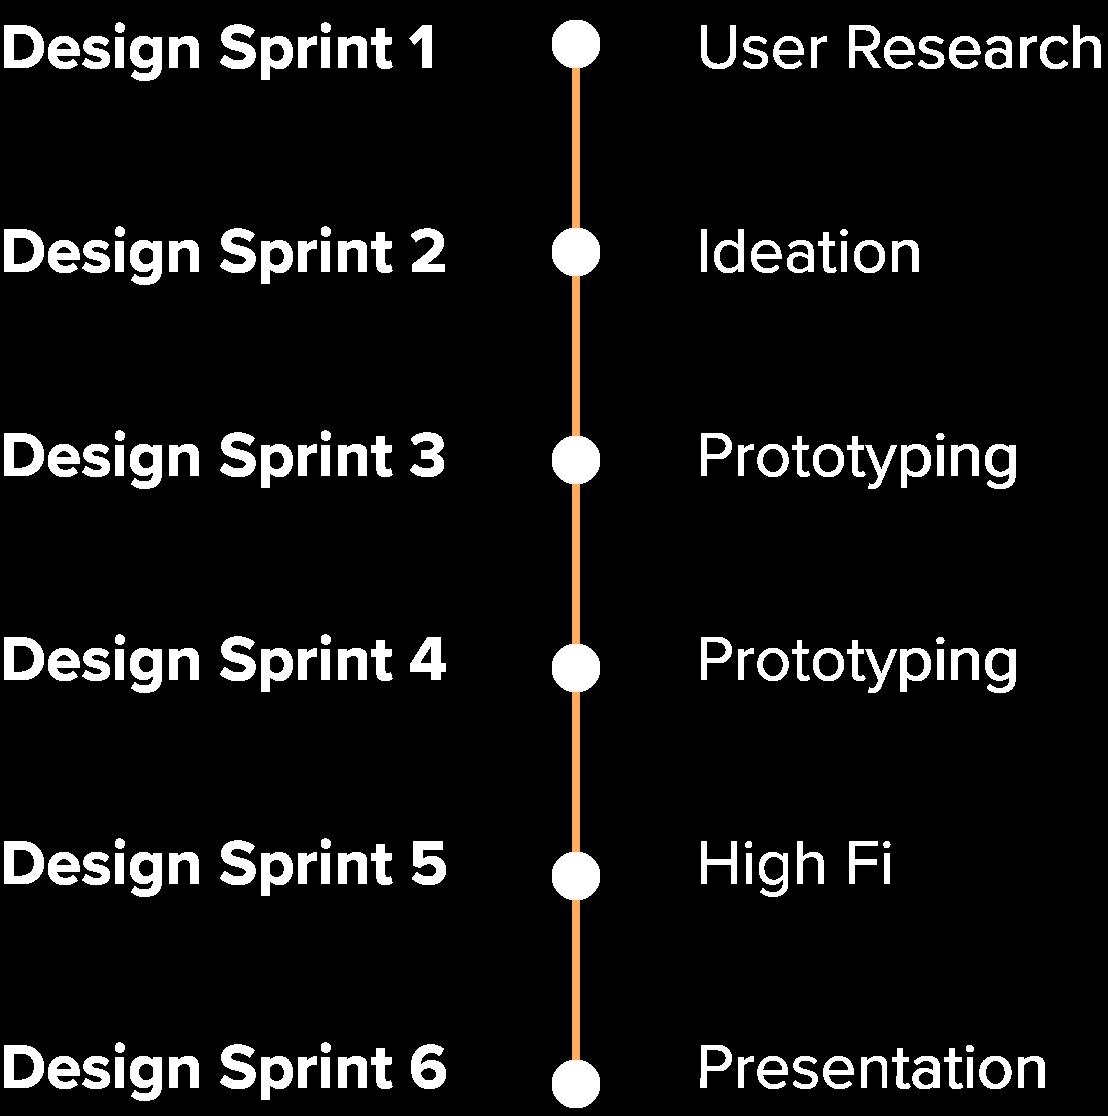 sprint-image